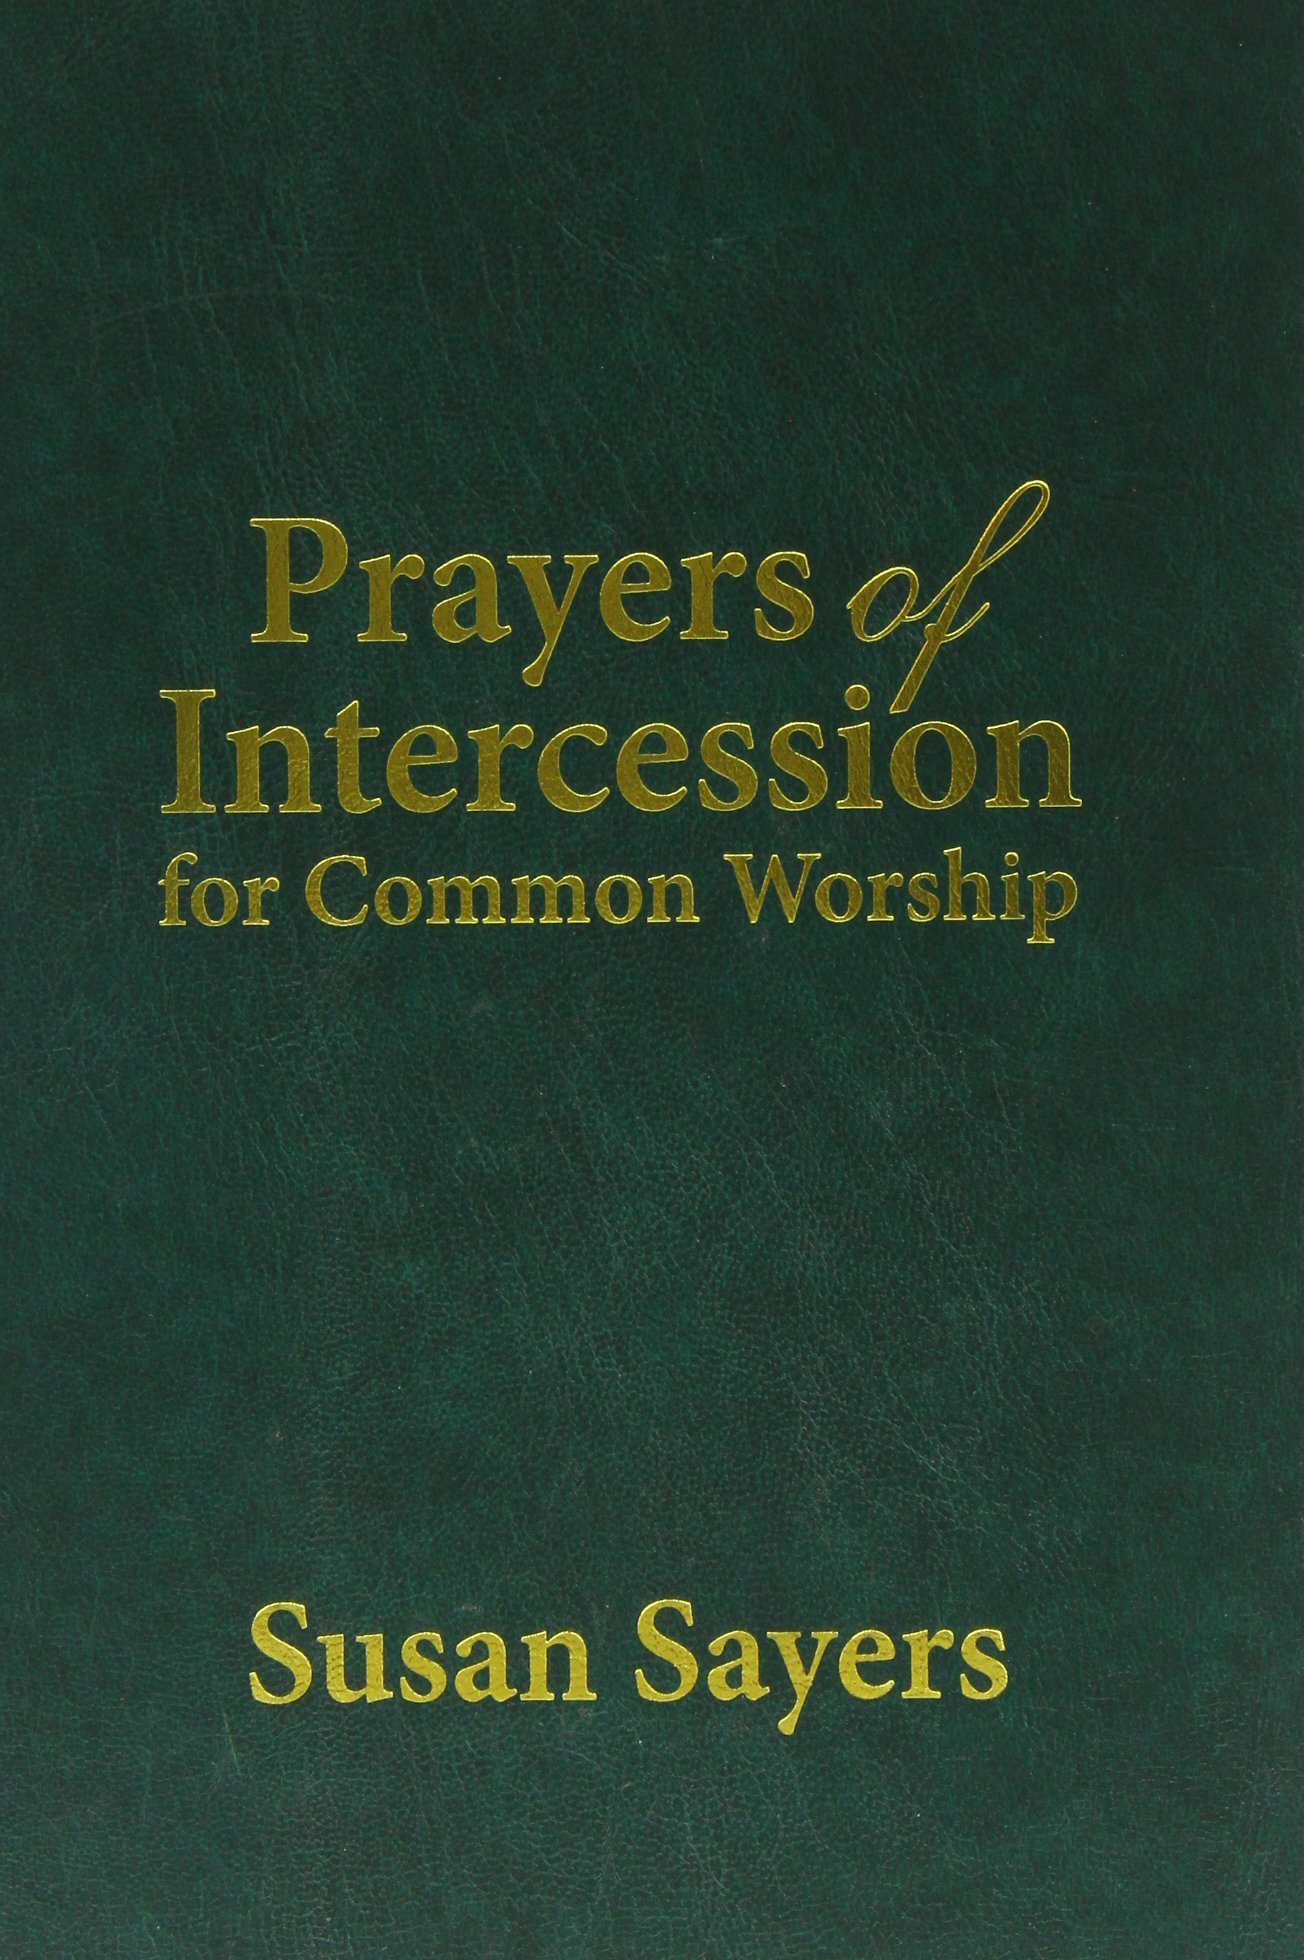 Prayers of Intercession for Common Worsh (Christian Books)